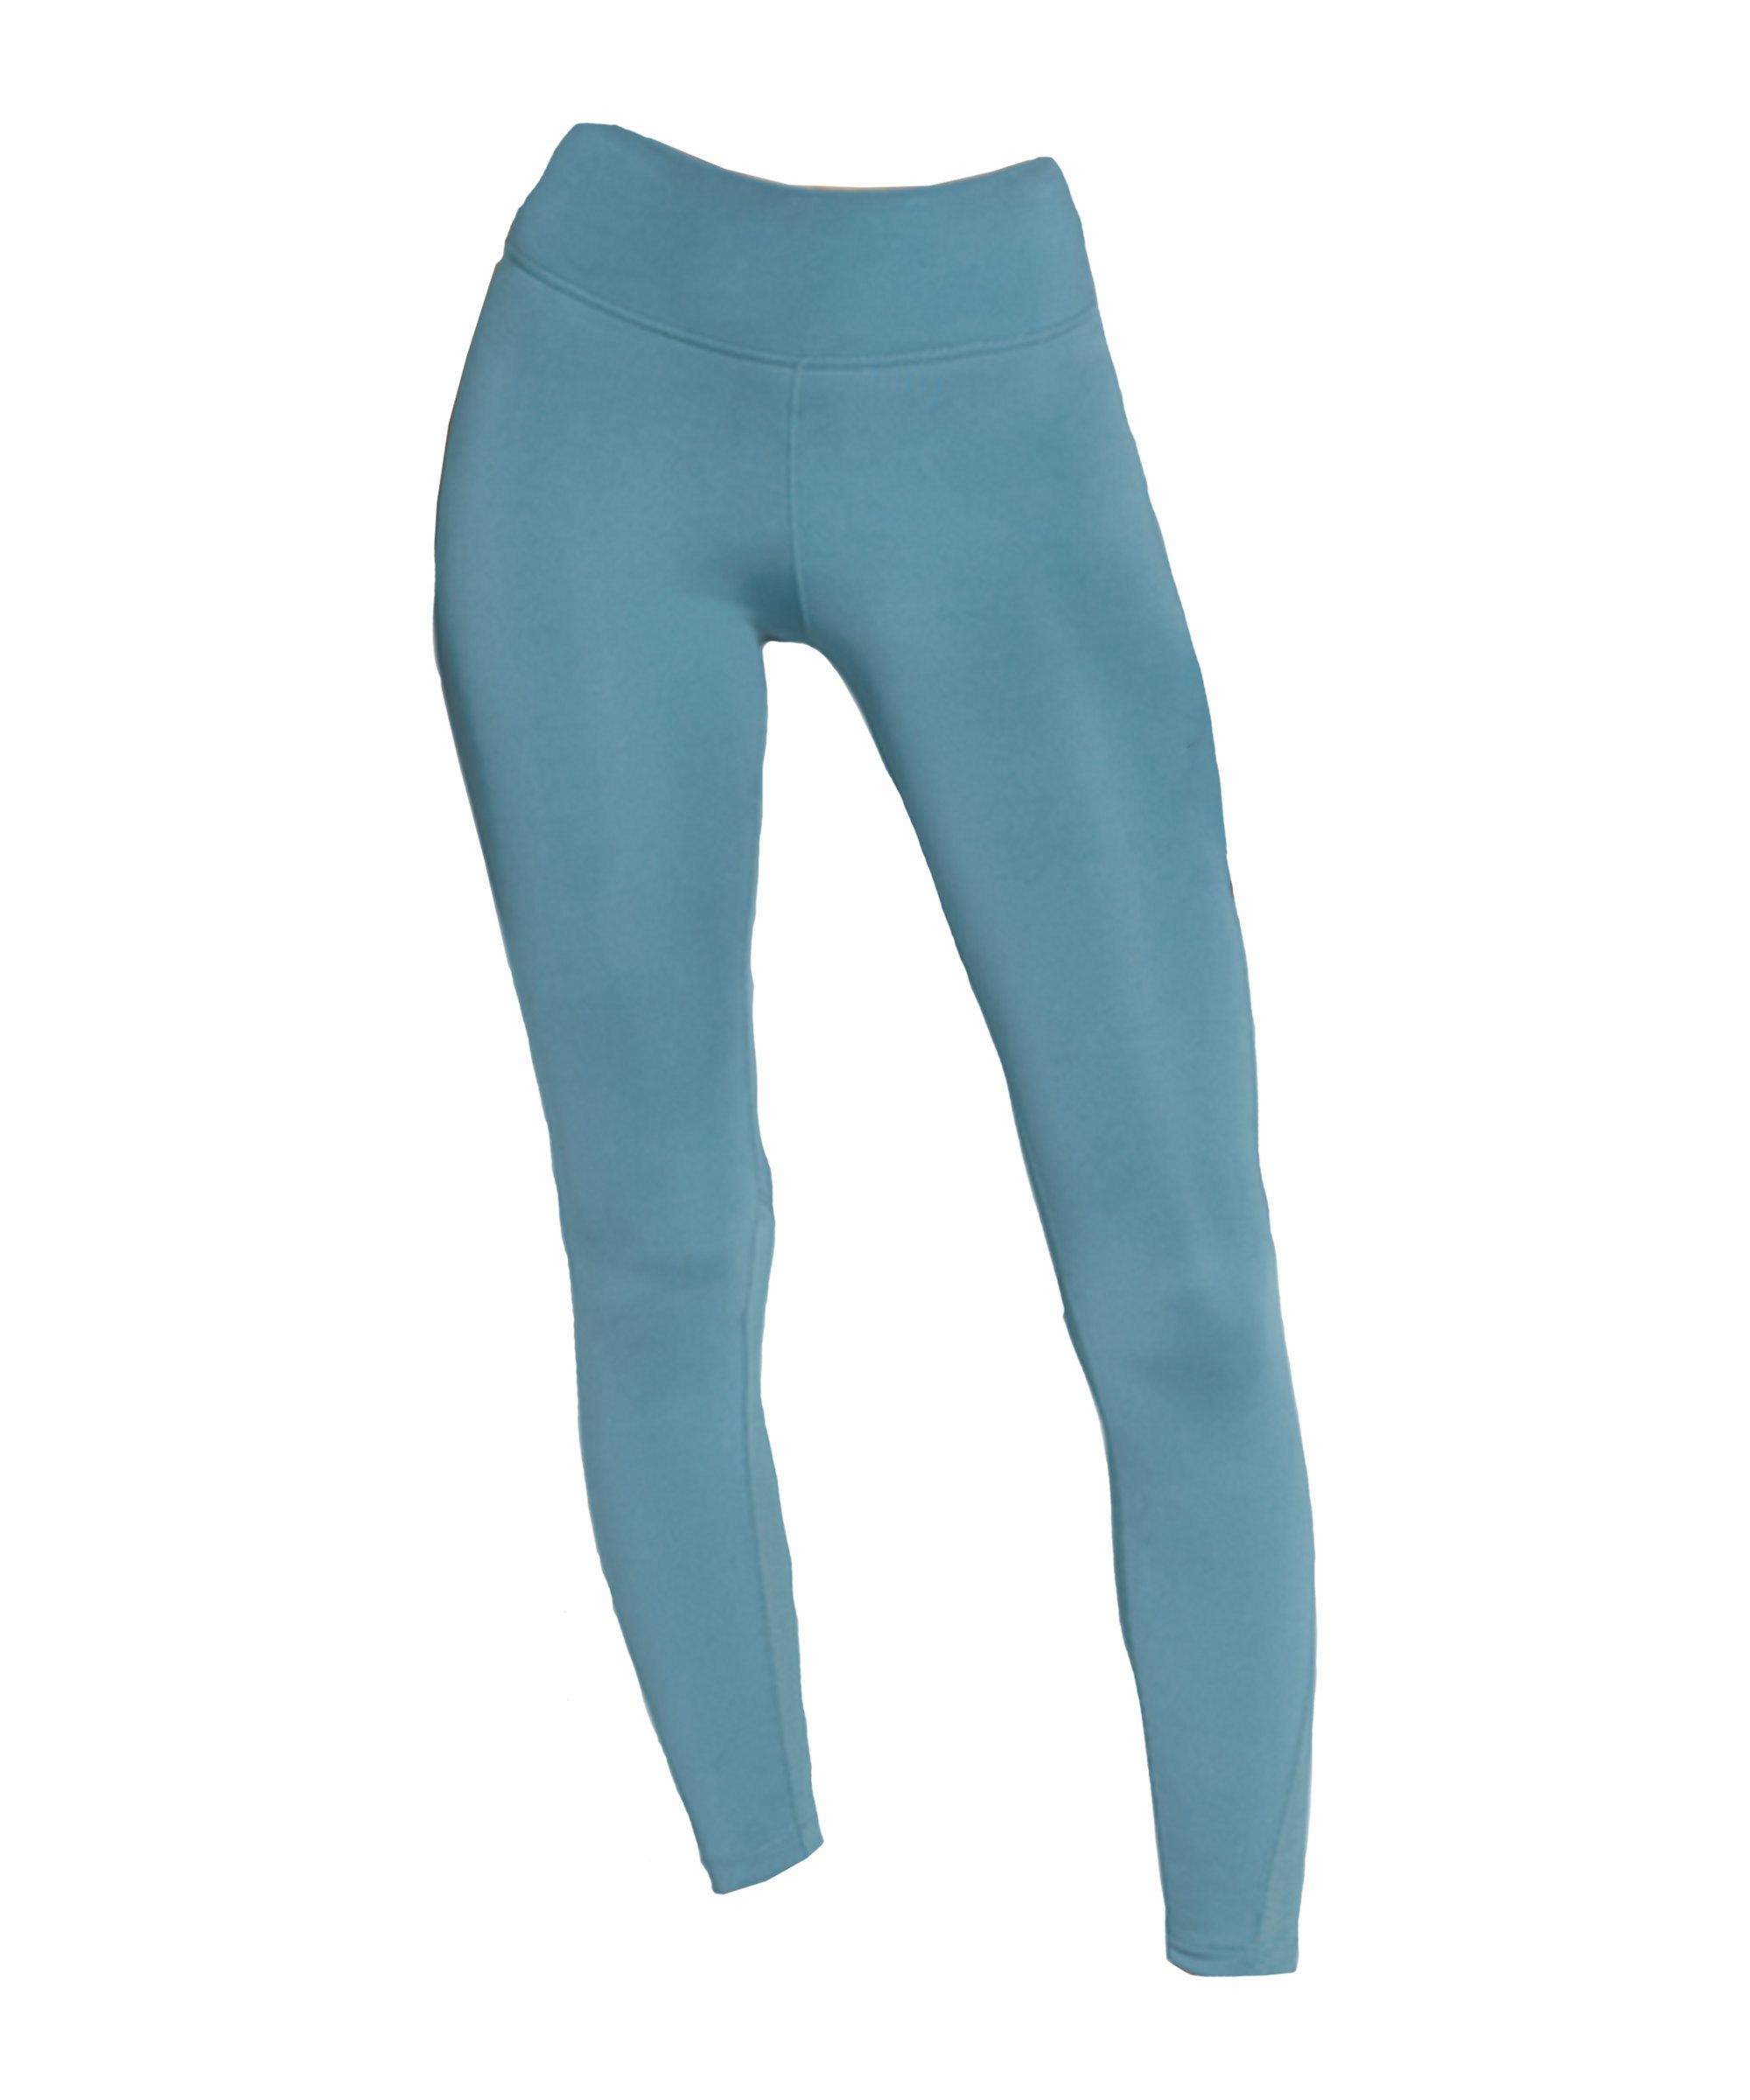 Nike One 7/8 Leggings Training Damen Blau F424 - blau